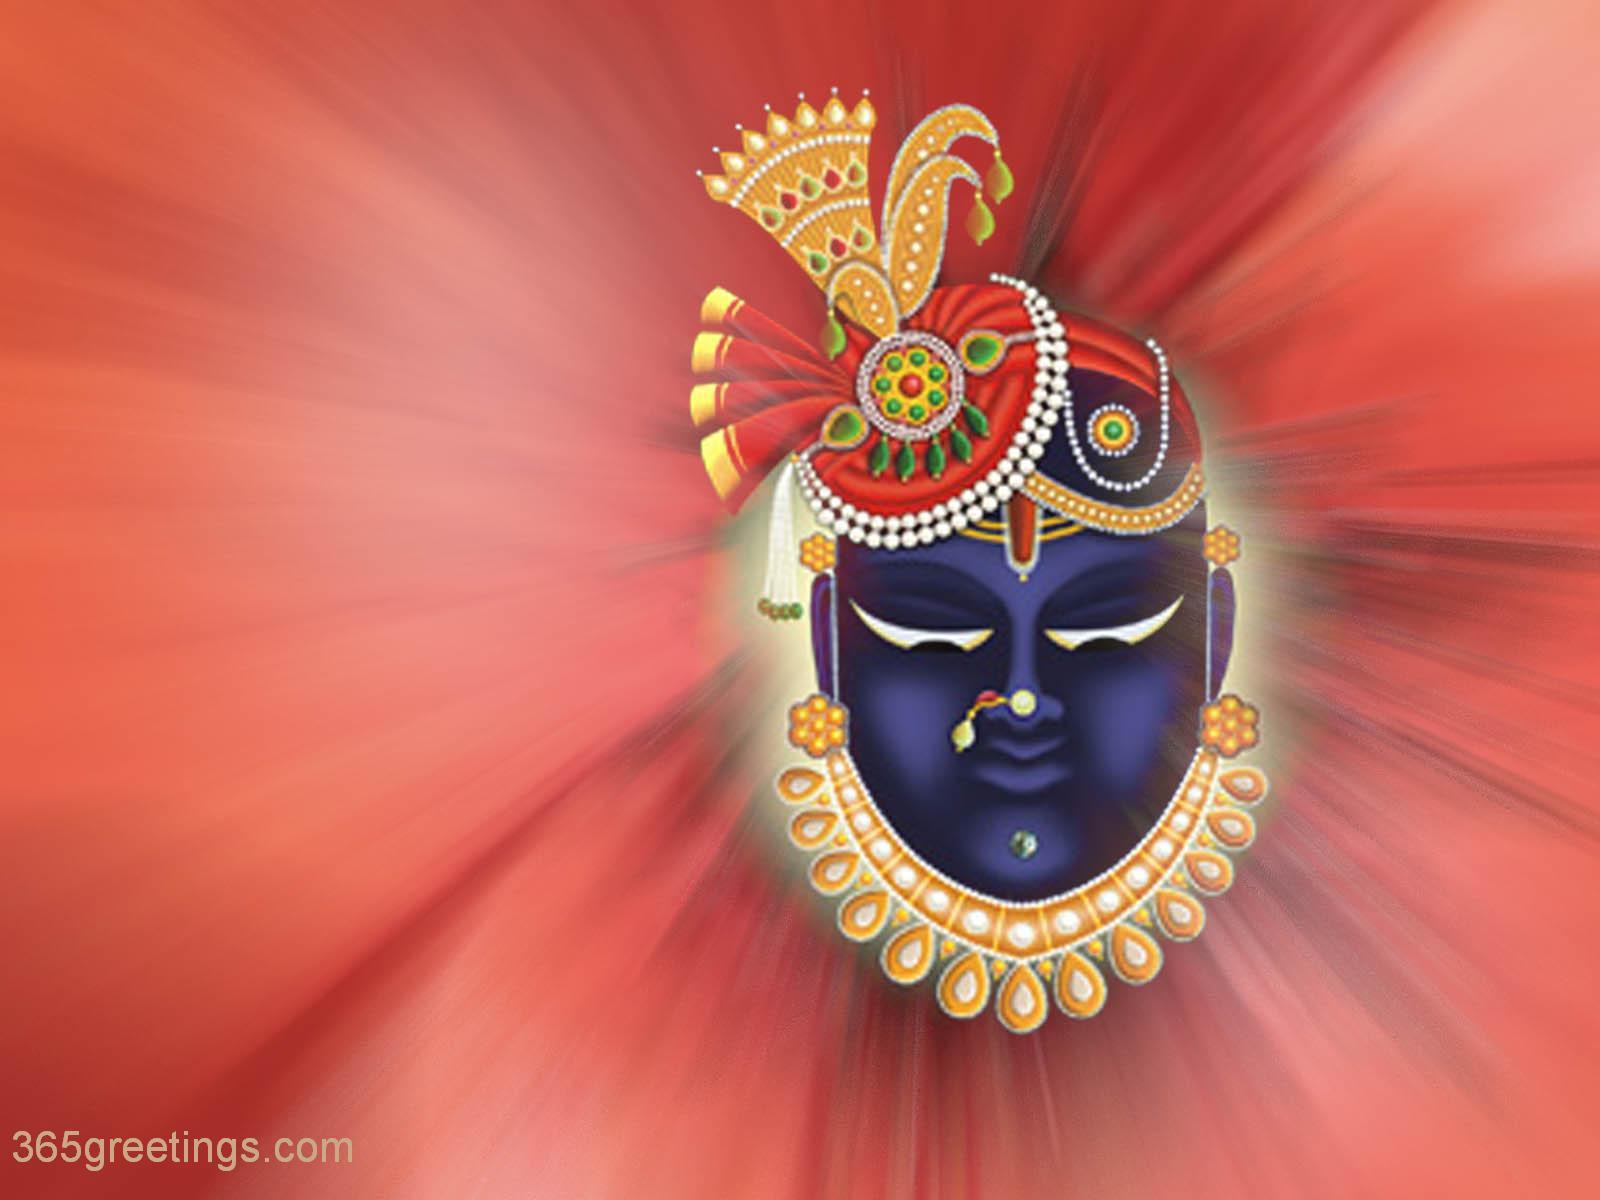 http://2.bp.blogspot.com/-pwUZoJcyWSk/TmSpxIYYh7I/AAAAAAAAAUE/wWIrqTS4f2A/s1600/Lord-Shreenathji-Wallpapers-3.jpg